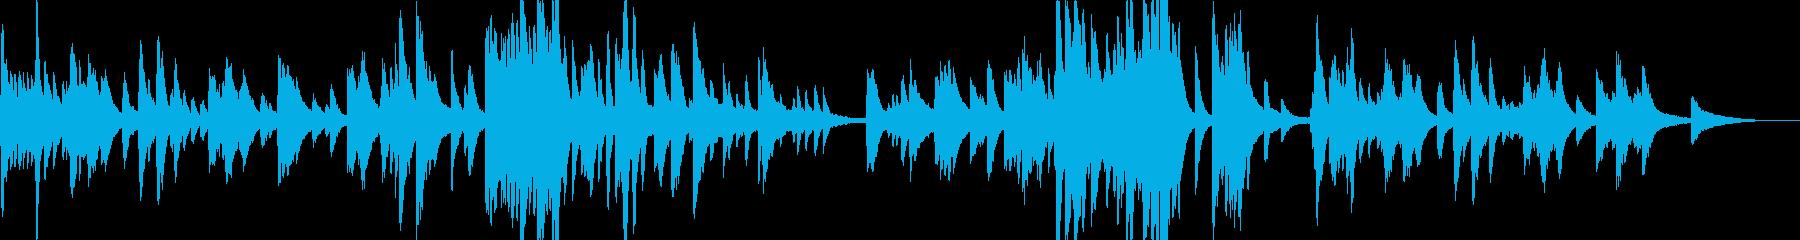 KANT寂しげな夏のバラード612の再生済みの波形